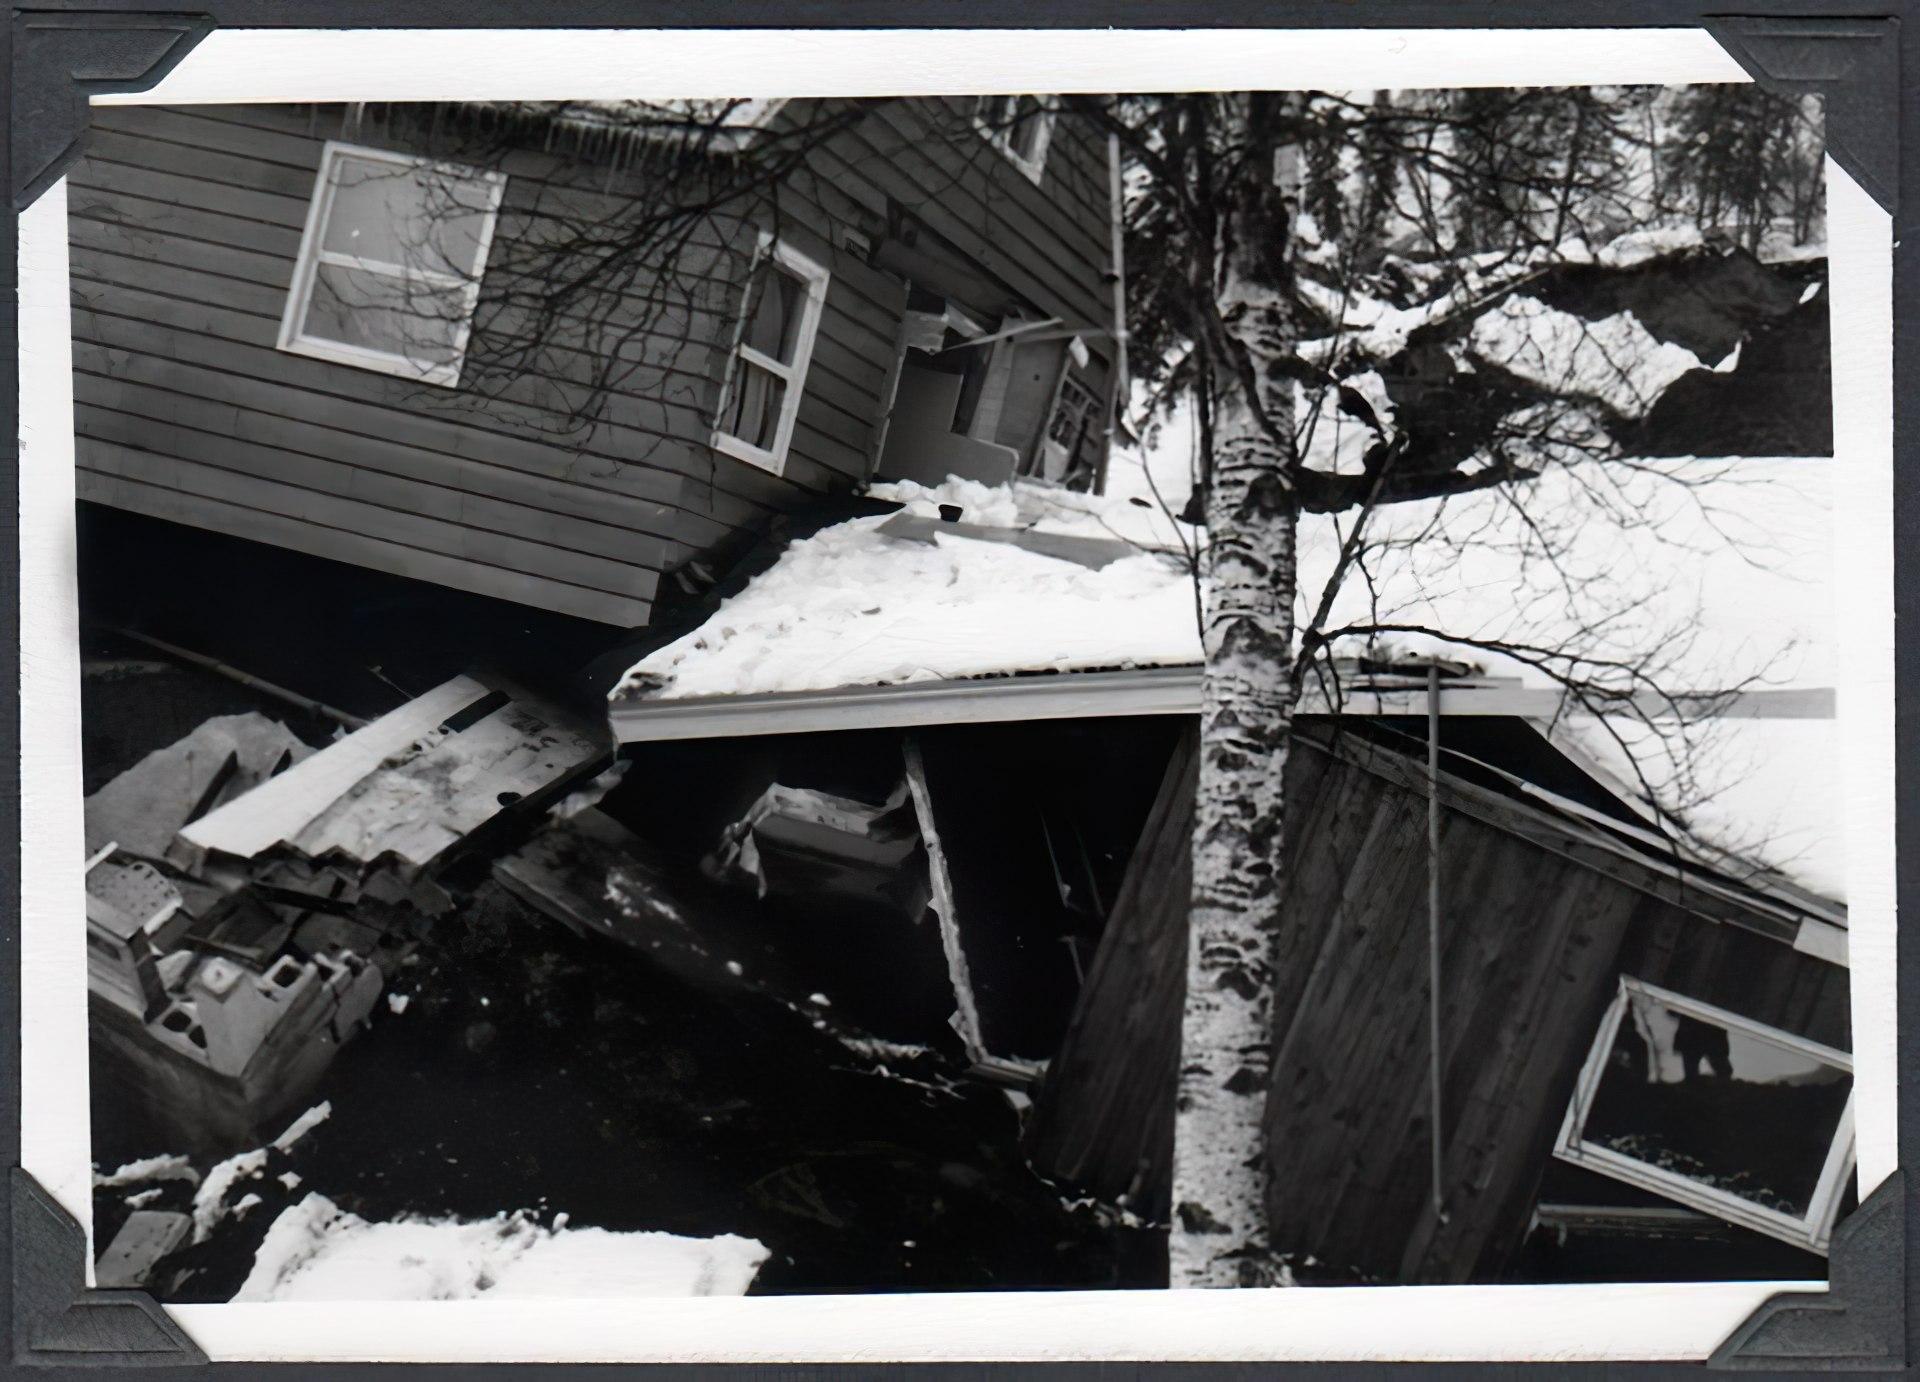 Incredible damage to homes in the Great Alaskan 1964 quake